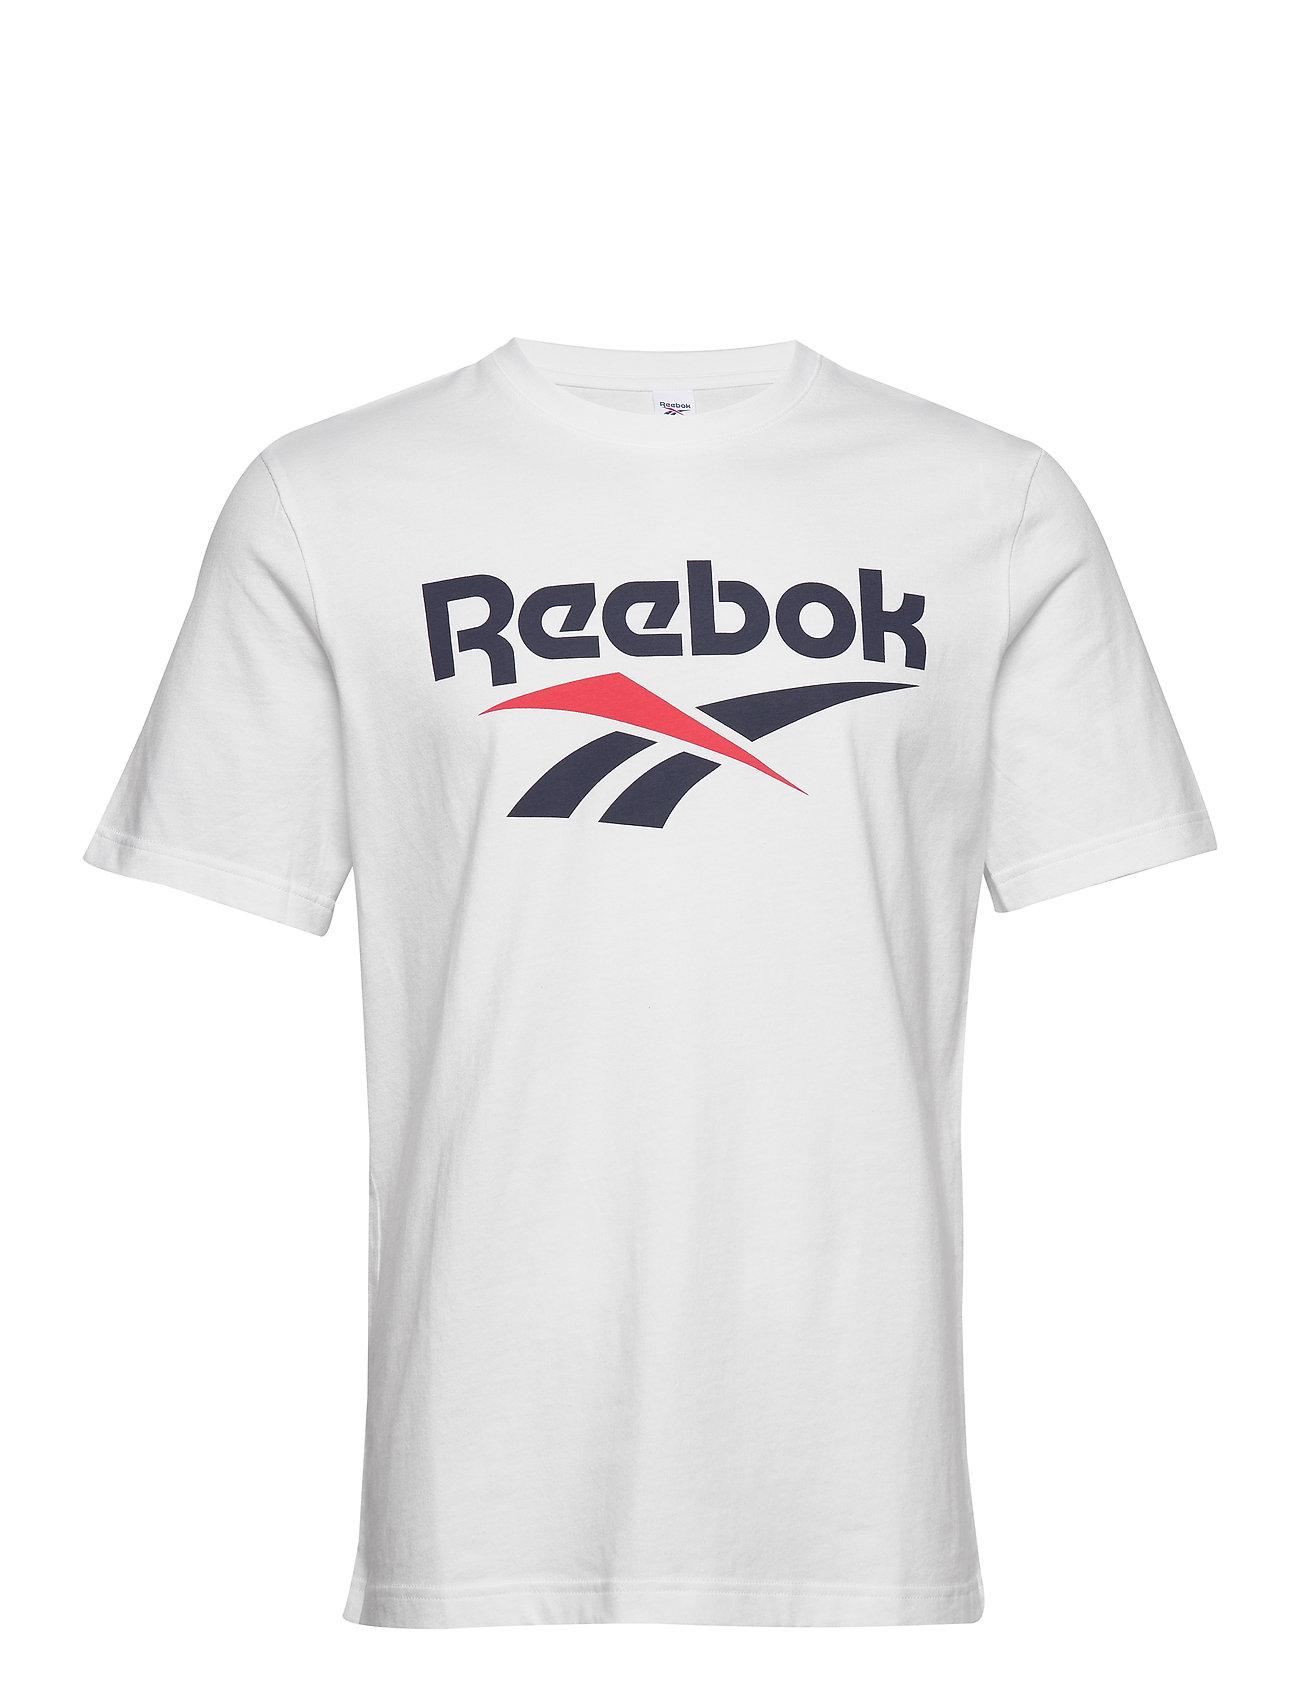 Reebok Classics CL F VECTOR TEE - WHITE